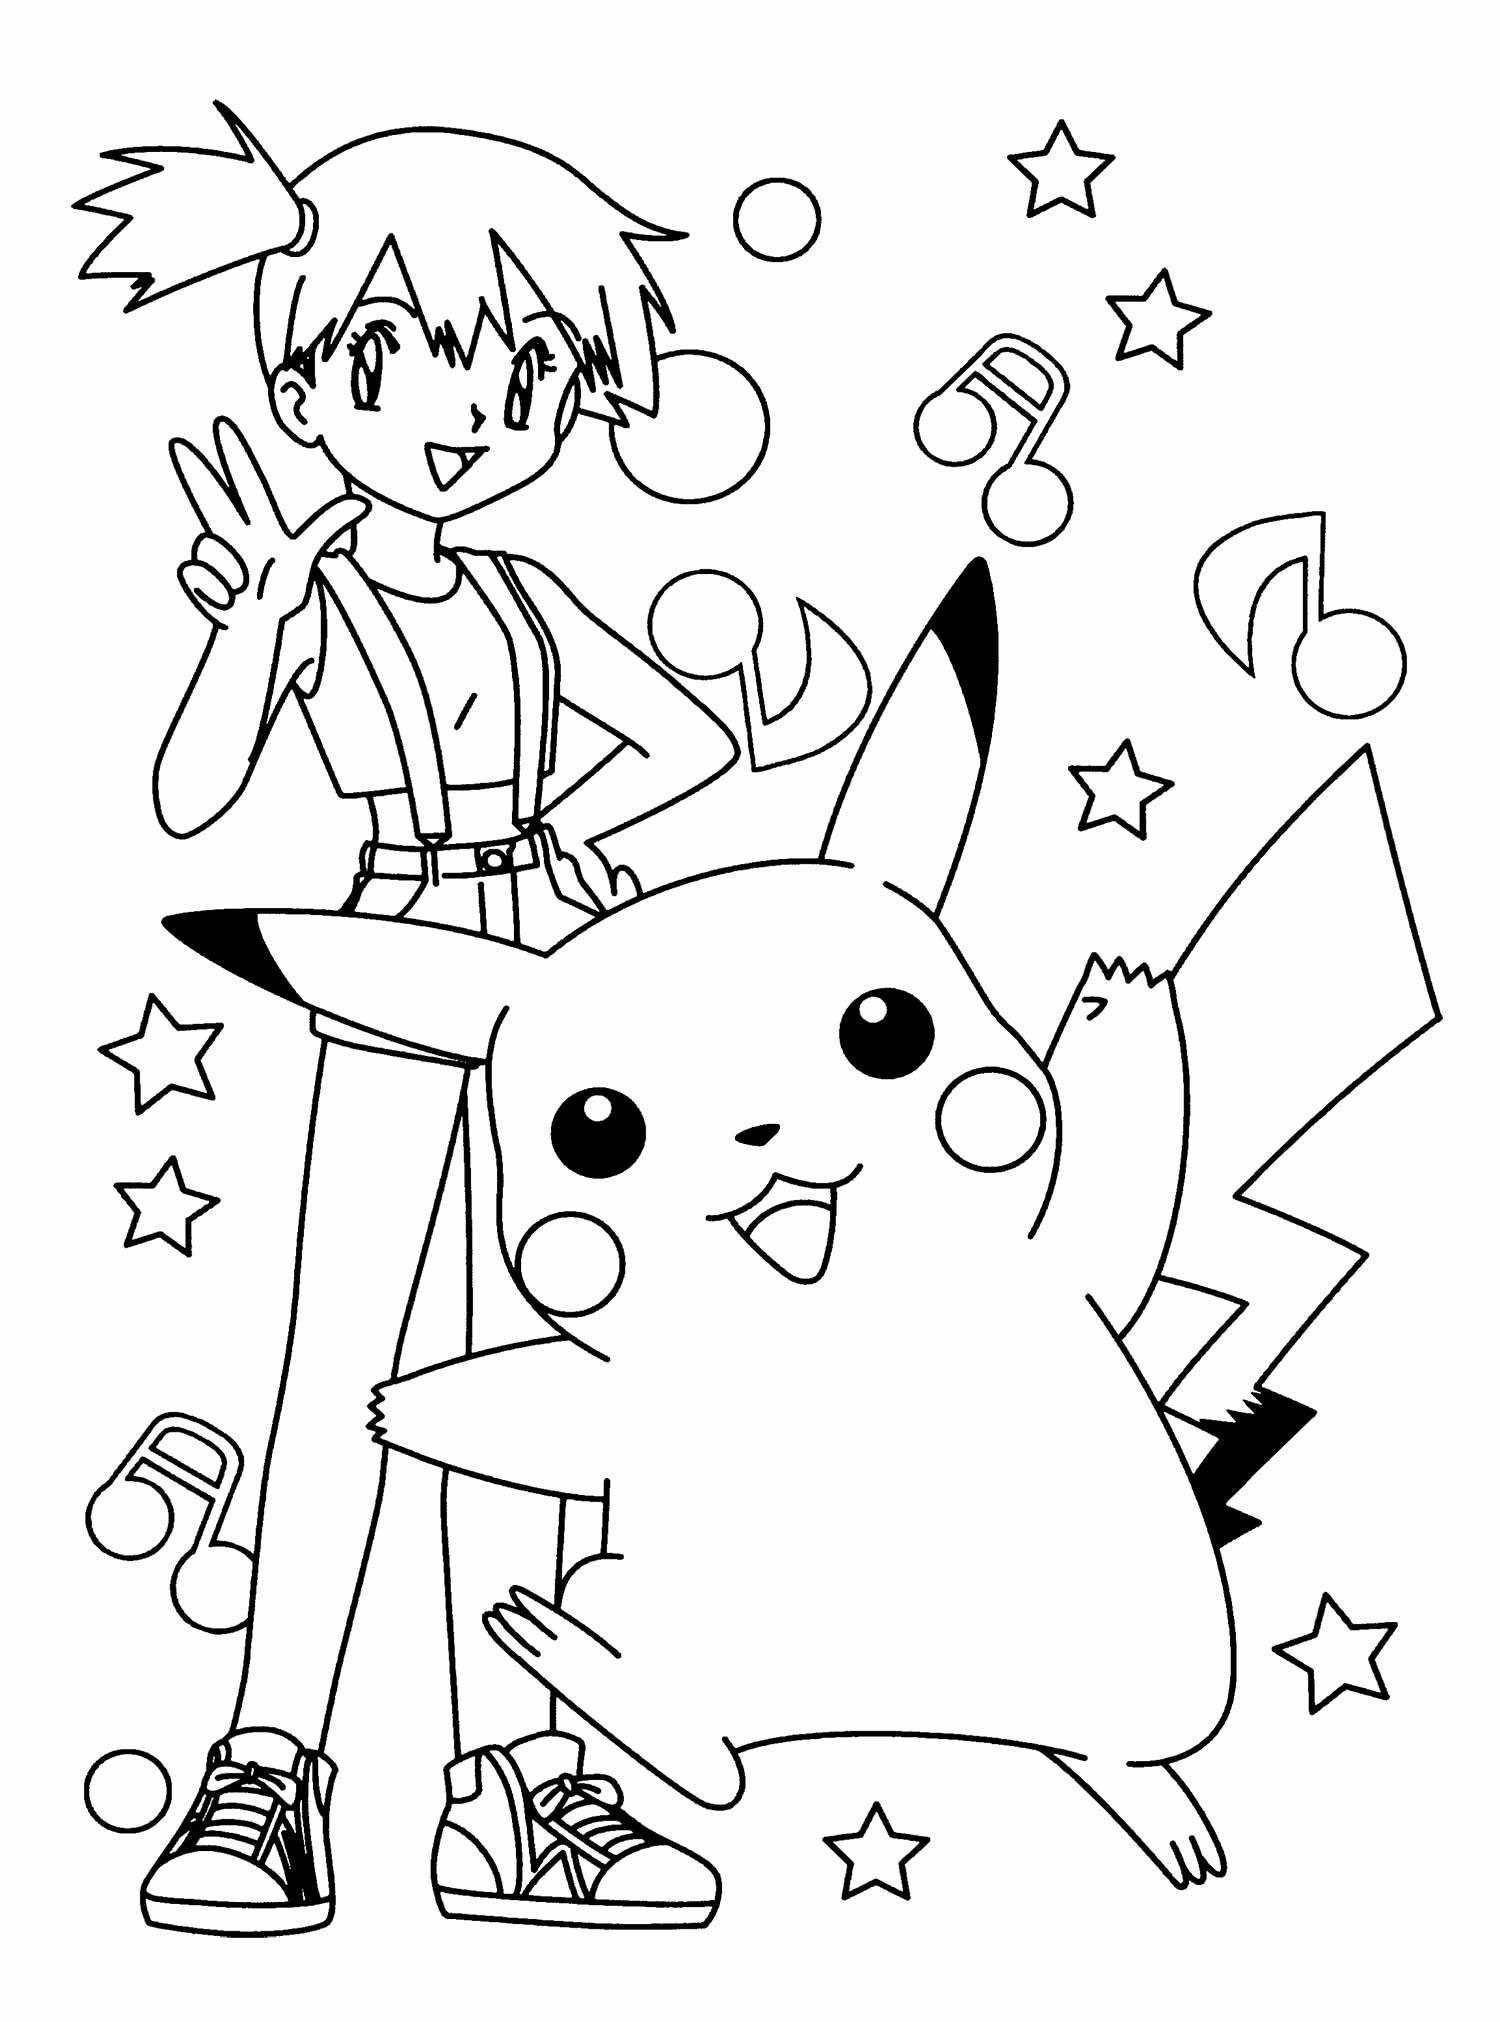 Alolan Raichu Coloring Page Lovely Pokemon Trainer Raichu Coloring